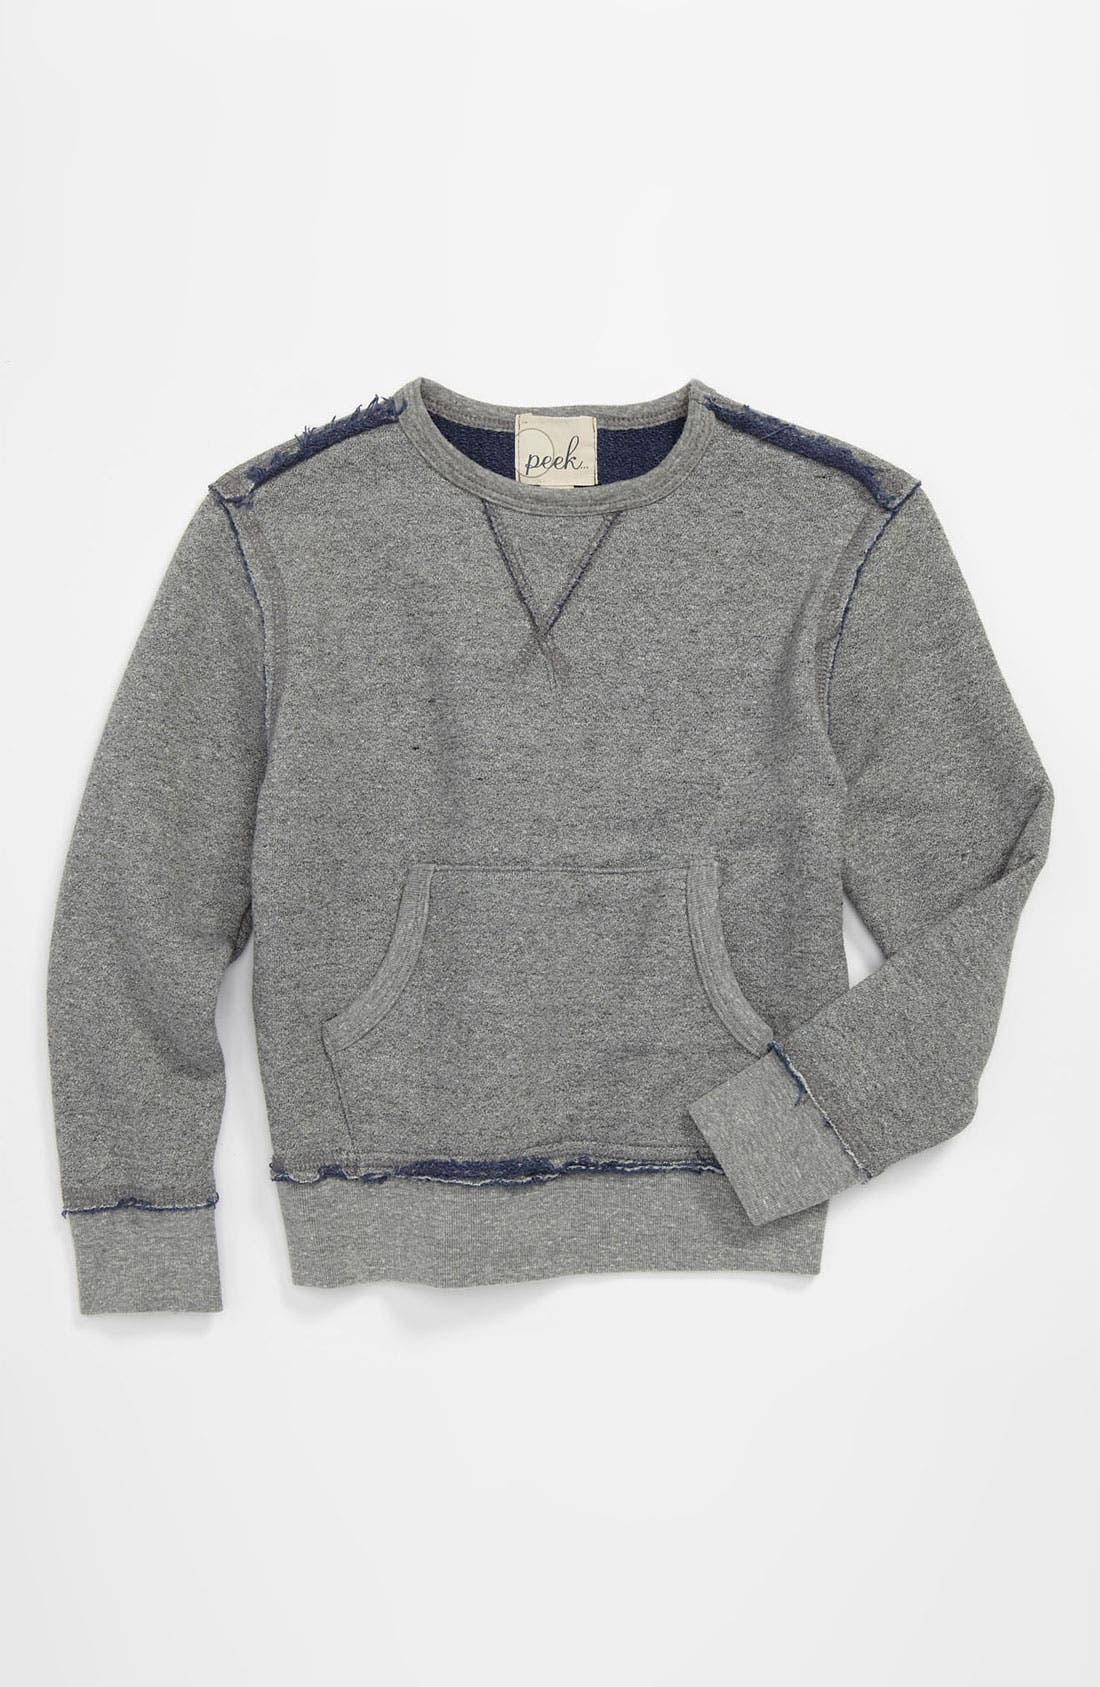 Main Image - Peek 'Bradley' Sweater (Little Boys & Big Boys)